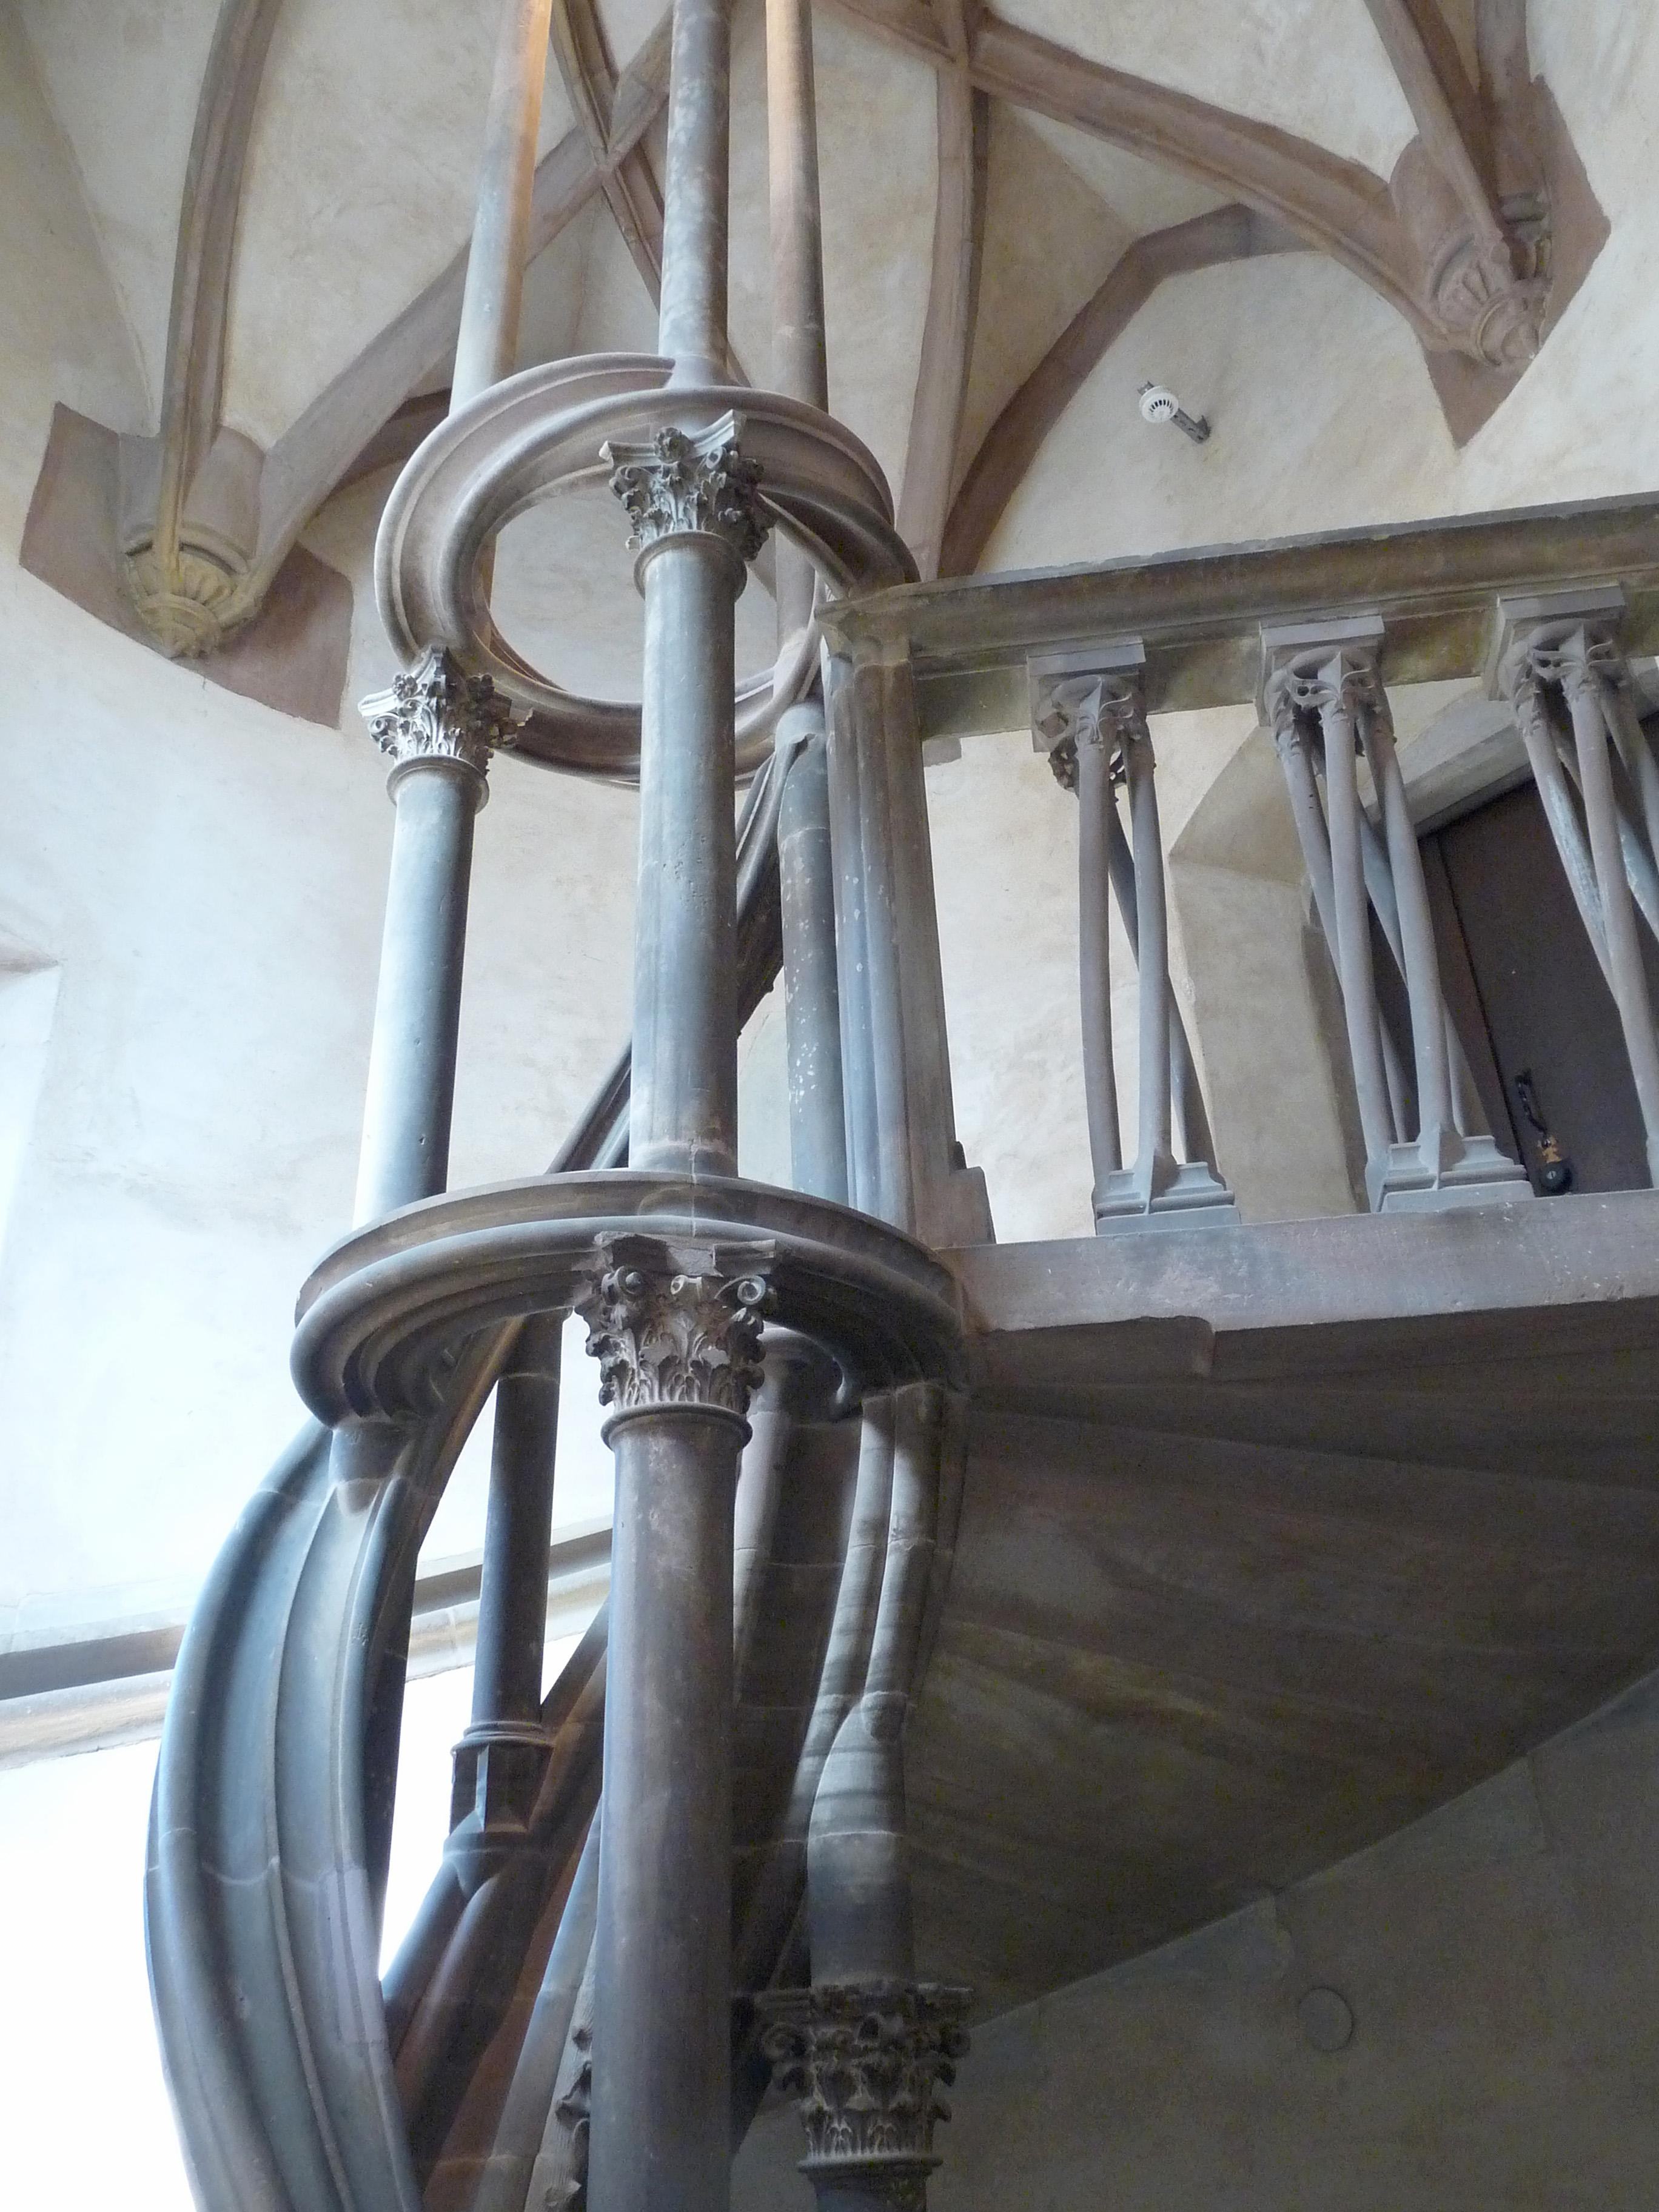 file escalier en vis ht uhlberger mus e de l 39 oeuvre notre dame 1 jpg wikimedia commons. Black Bedroom Furniture Sets. Home Design Ideas